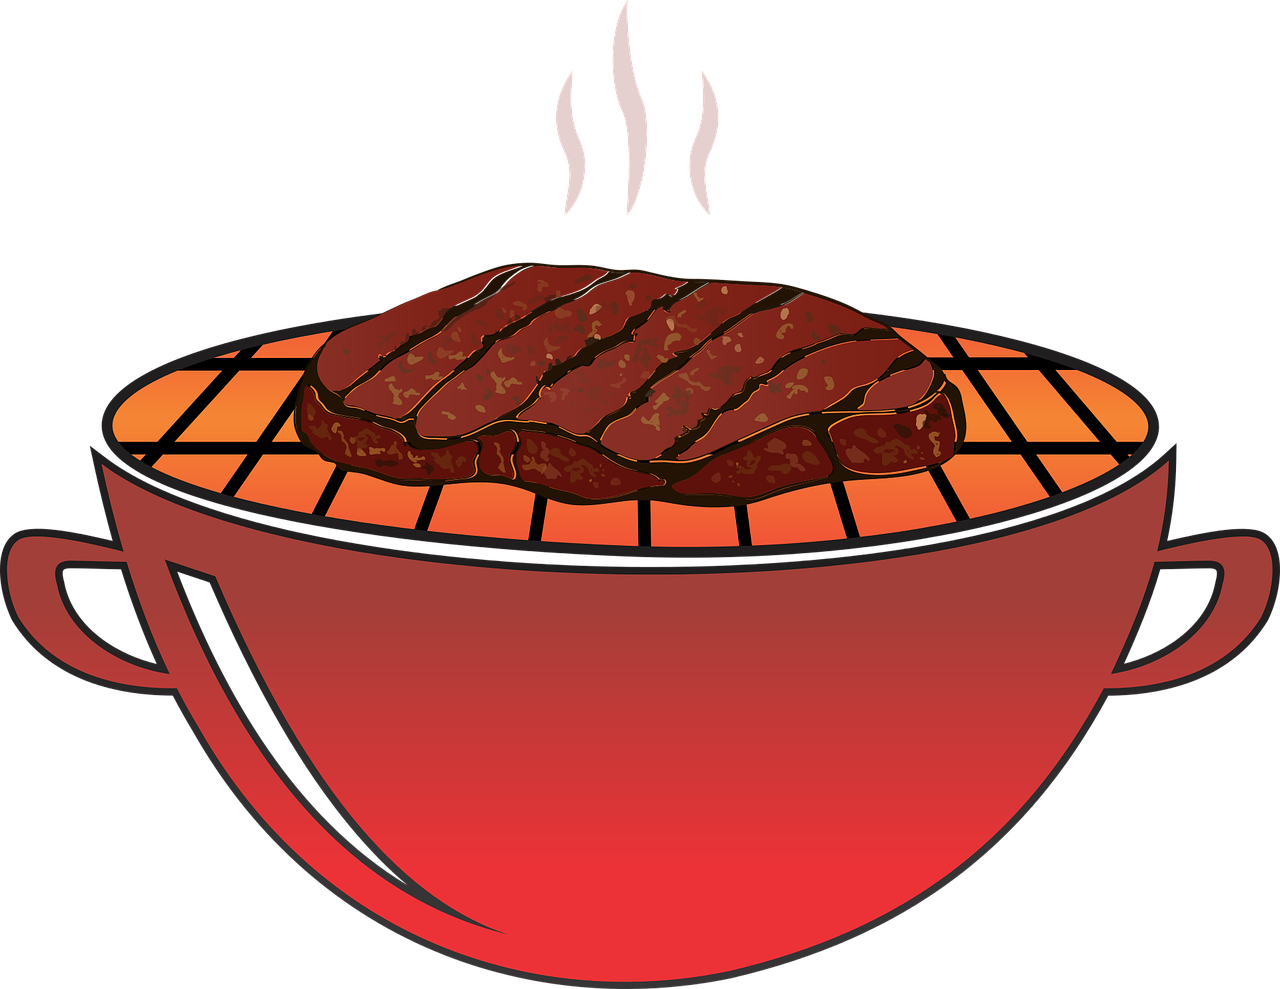 image transparent download Beefsteak Swiss steak Clip art